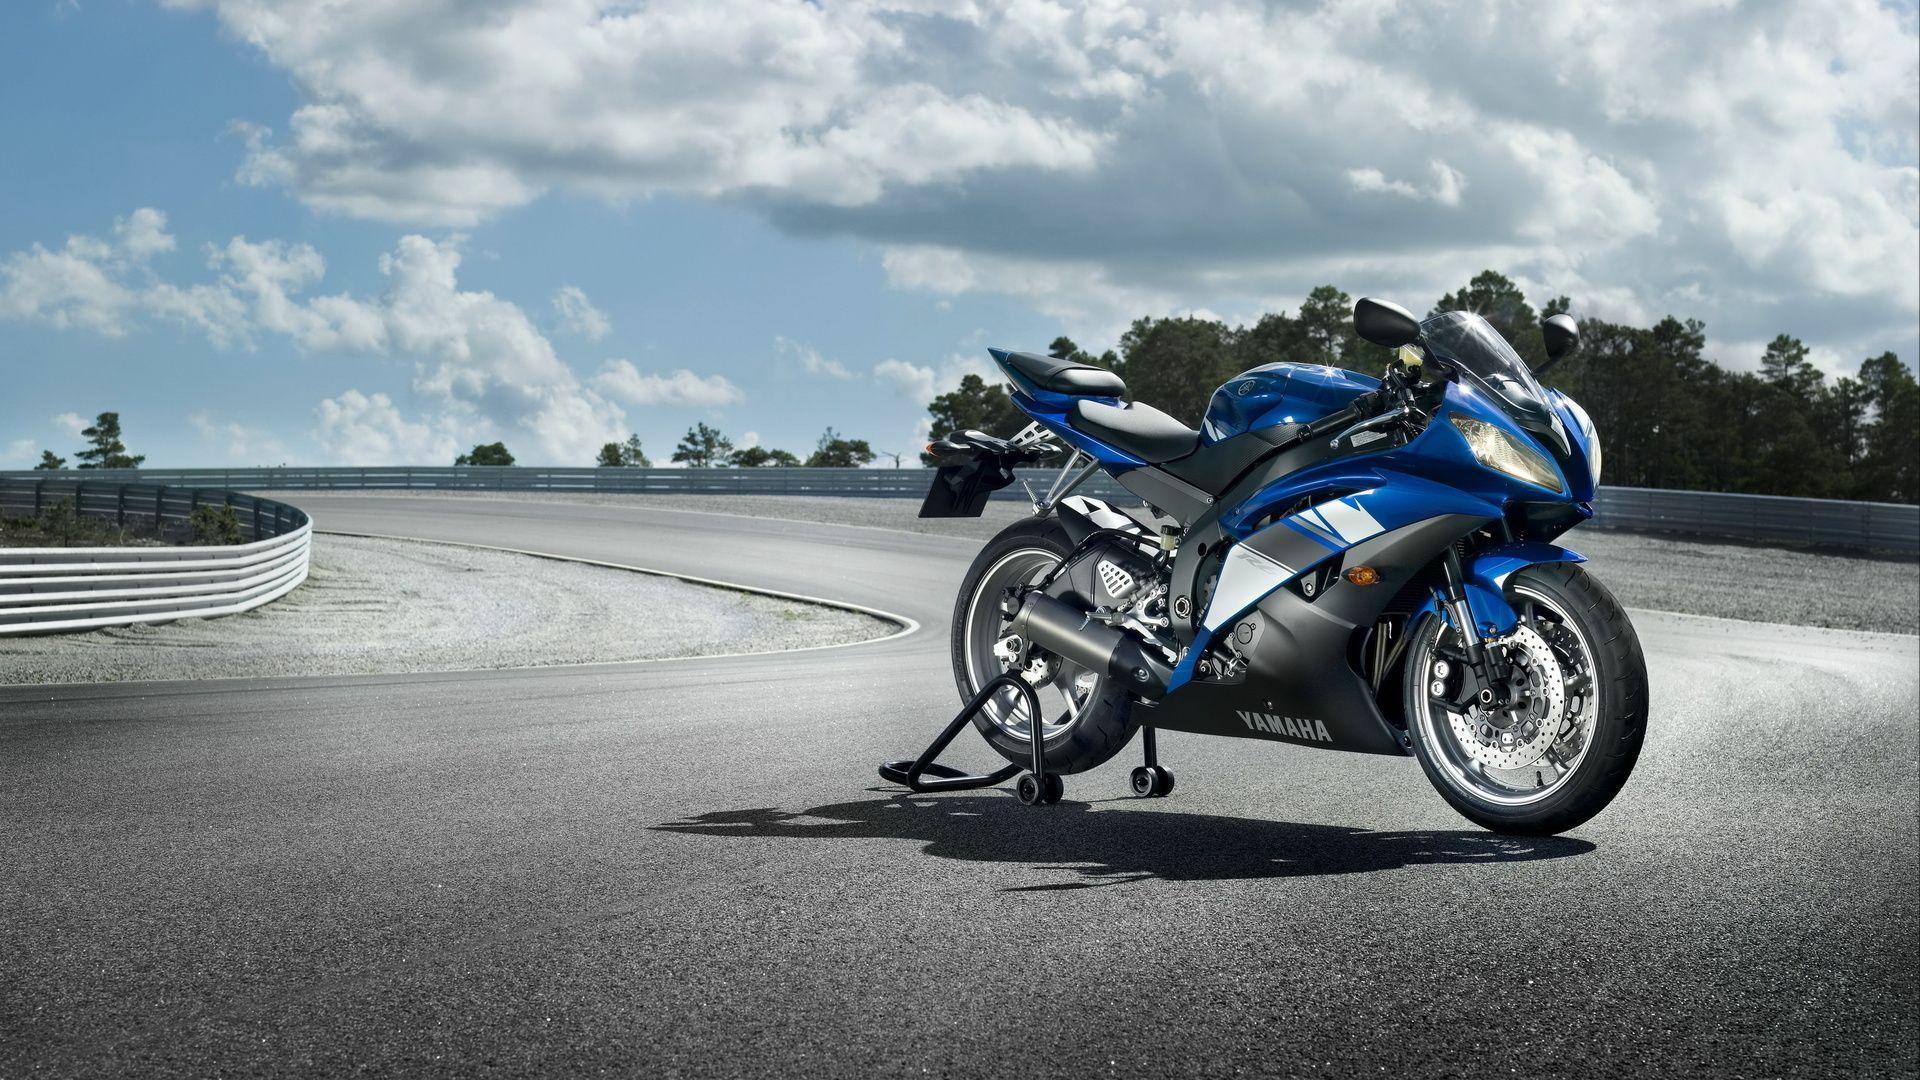 Wallpaper Android Mobile Sport: Yamaha Bike Wallpapers : Get Free Top Quality Yamaha Bike